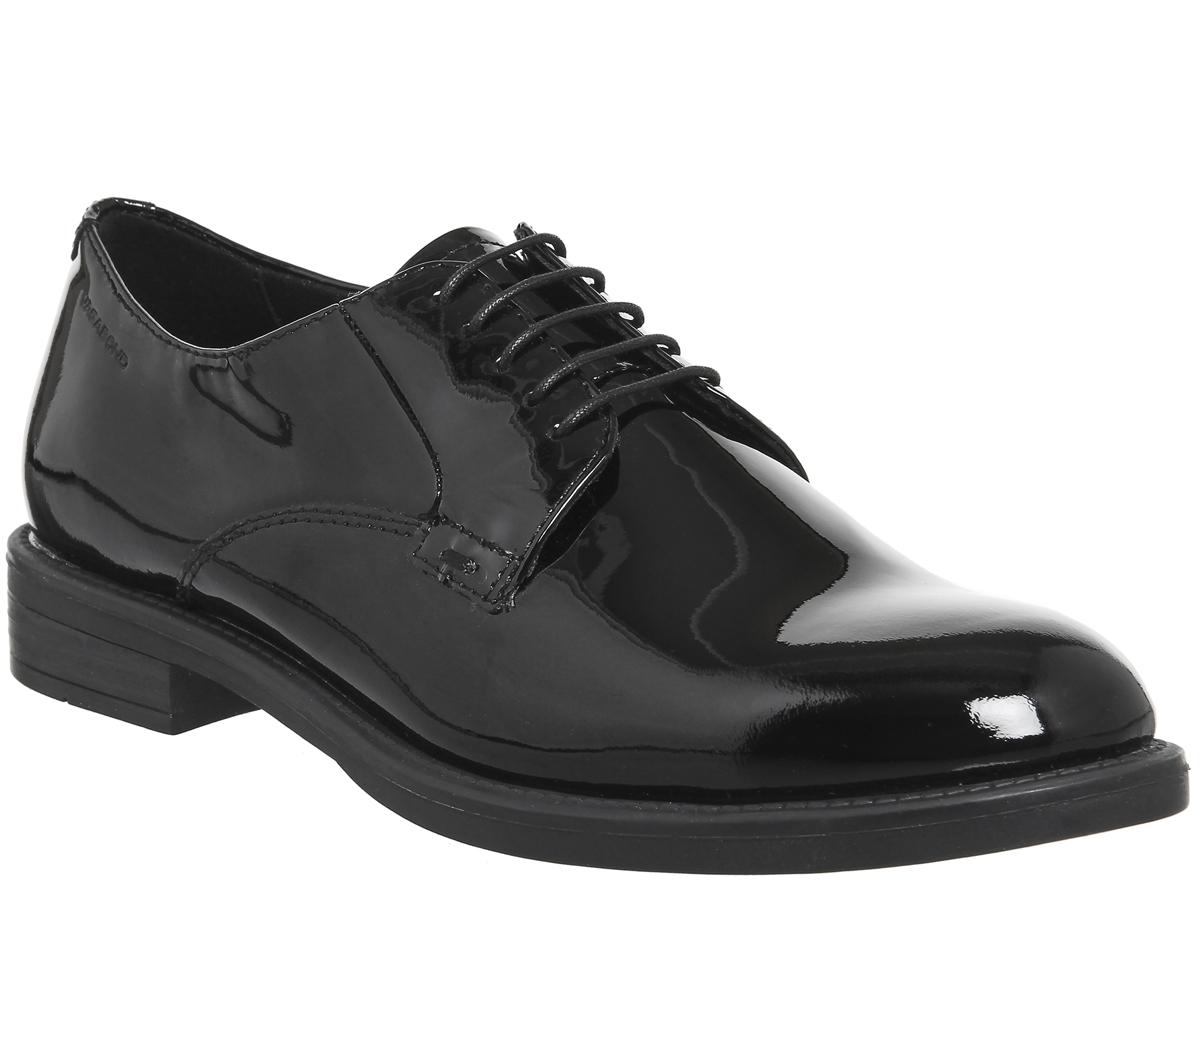 Damenschuhe Amina Vagabond Amina Damenschuhe Lace Schuhes BLACK PATENT Flats 0257bd